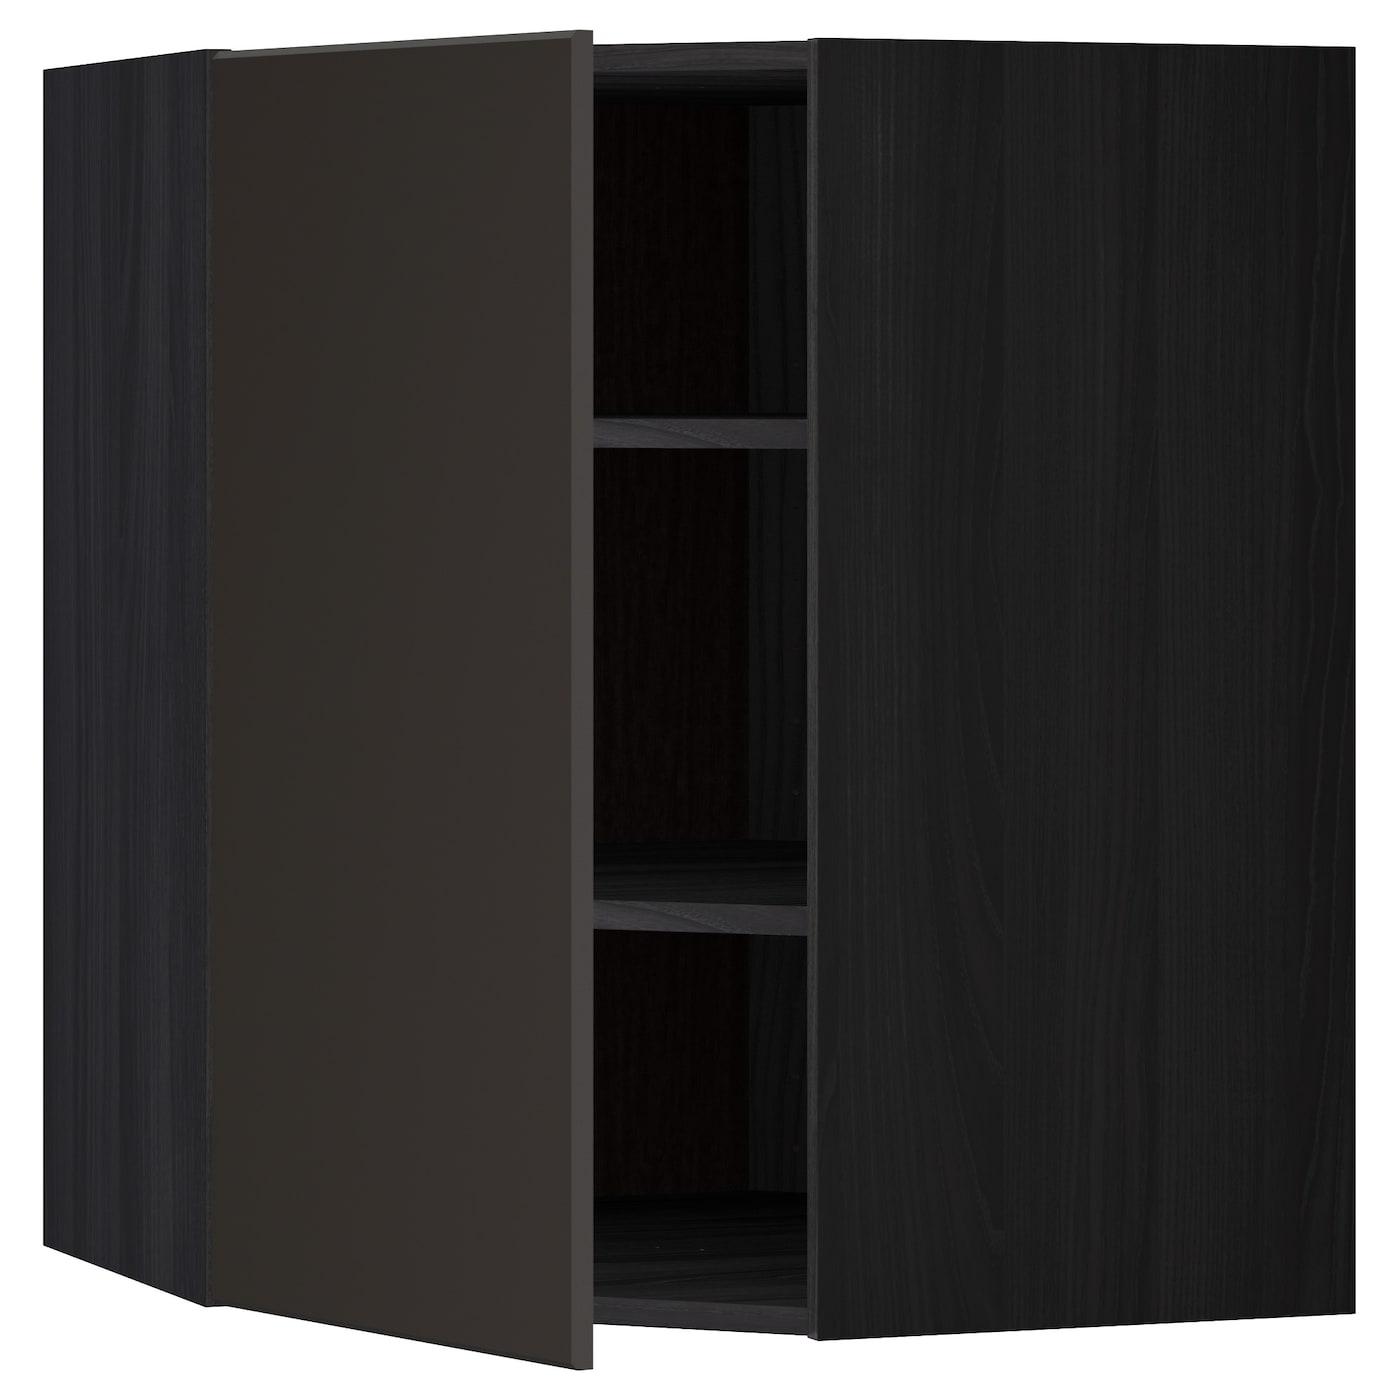 Metod Corner Wall Cabinet With Shelves Black Kungsbacka